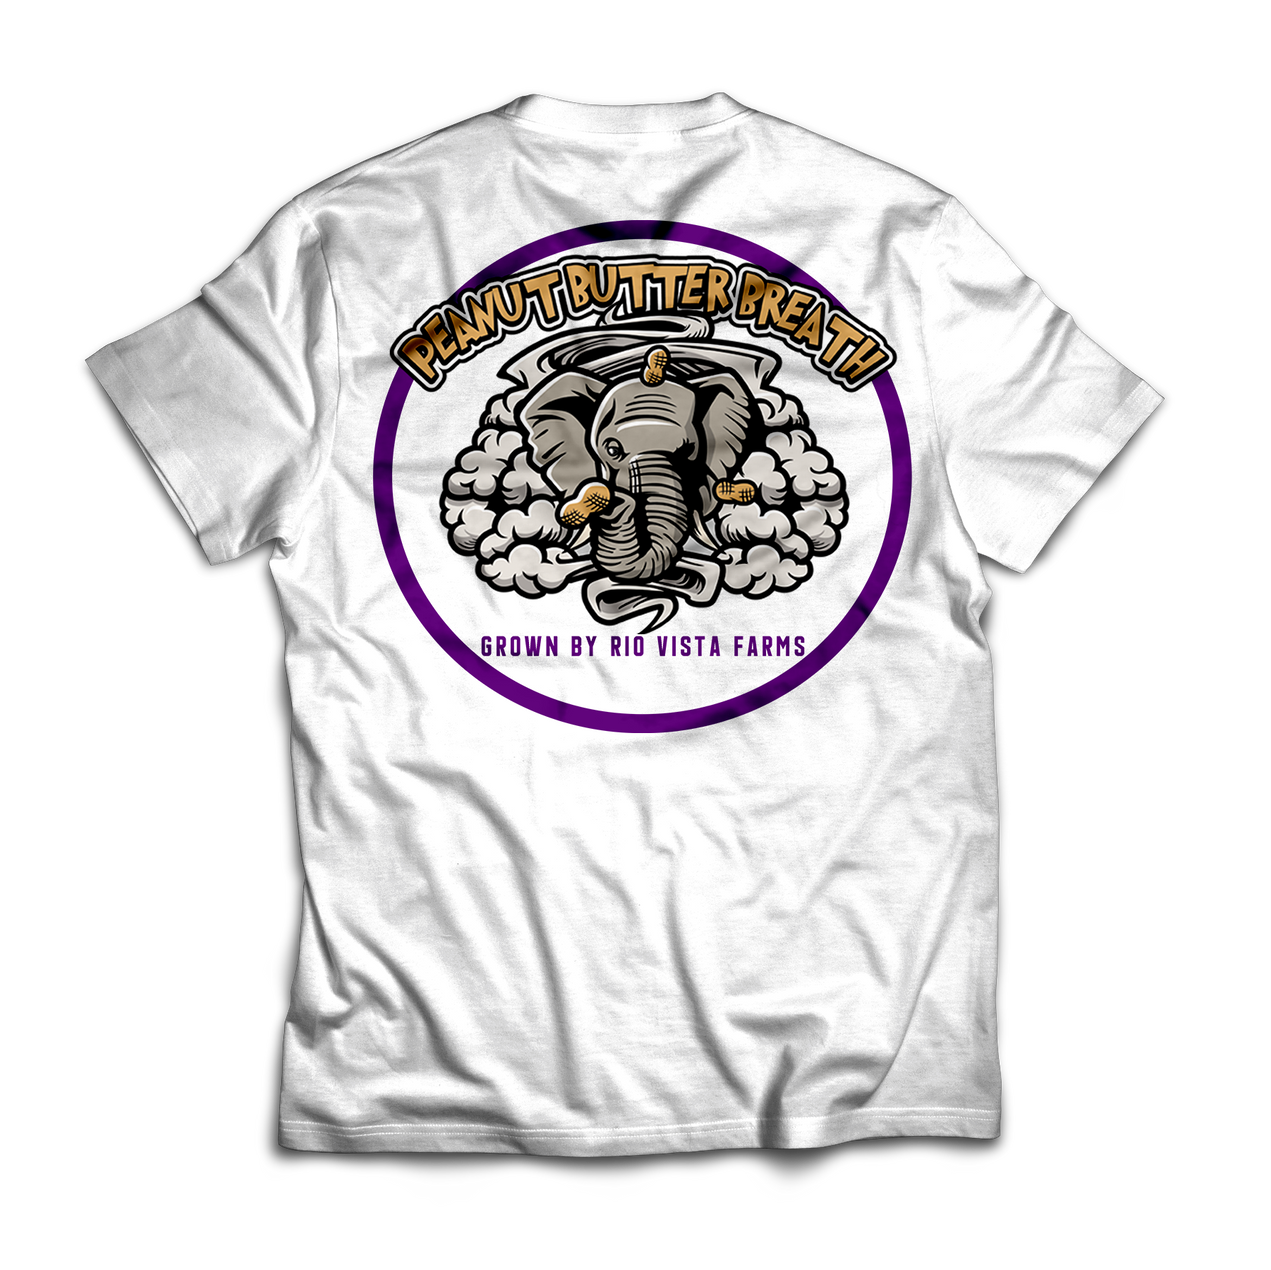 T Shirt at Rio Vista Farms